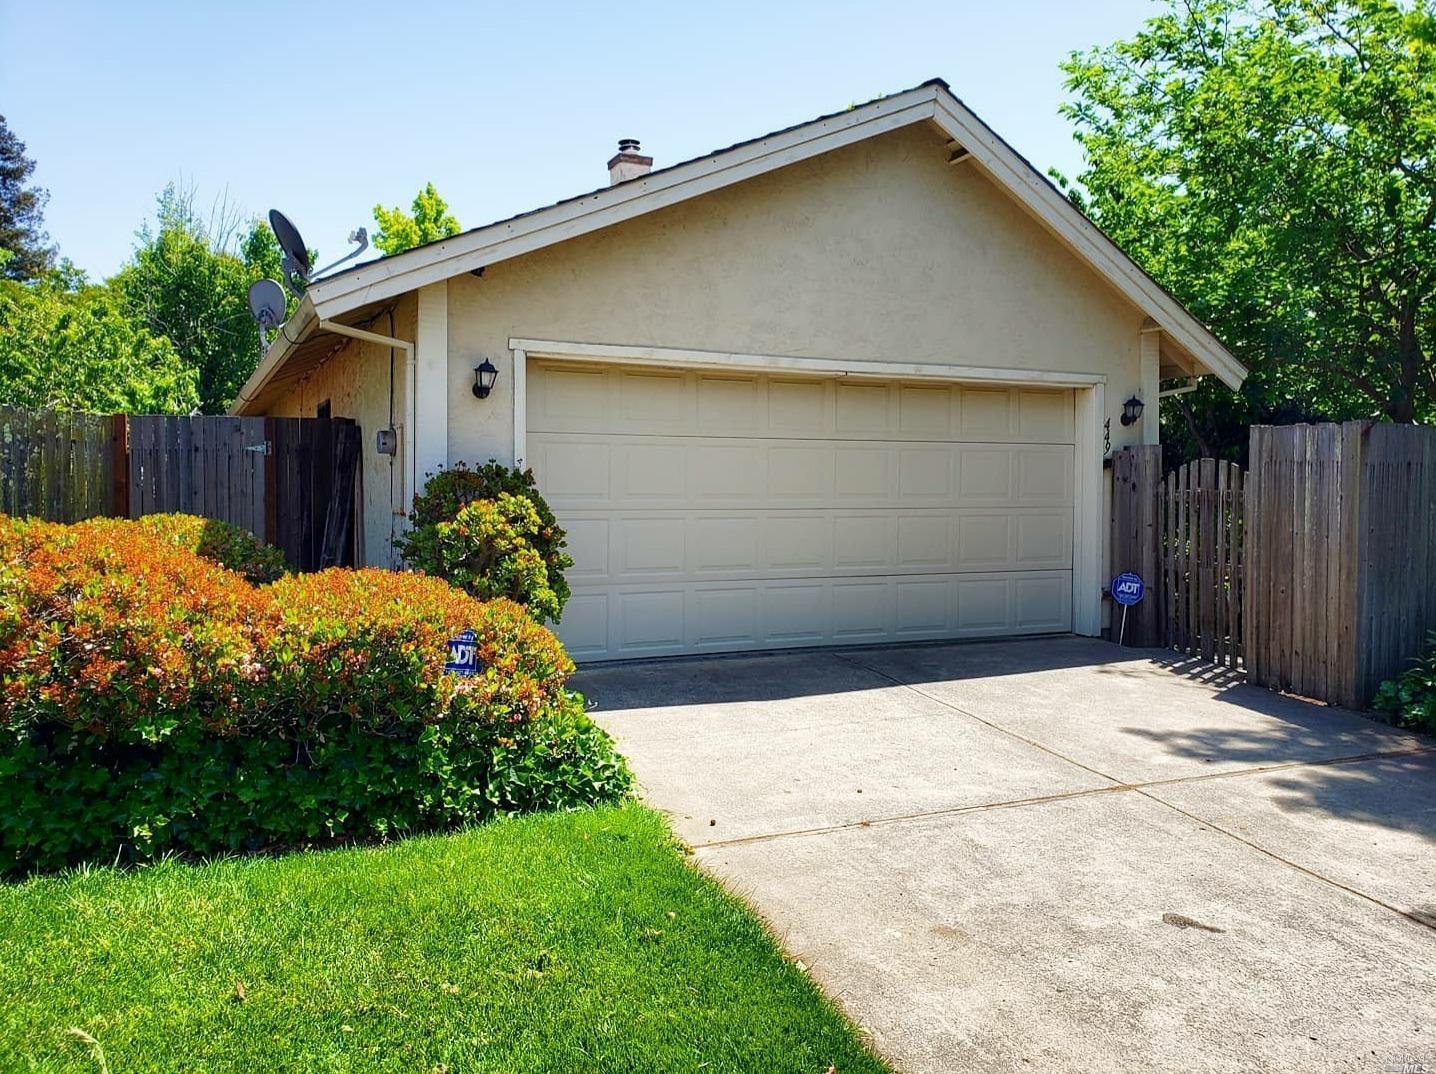 449 Hawthorne Lane, Benicia, CA 94510